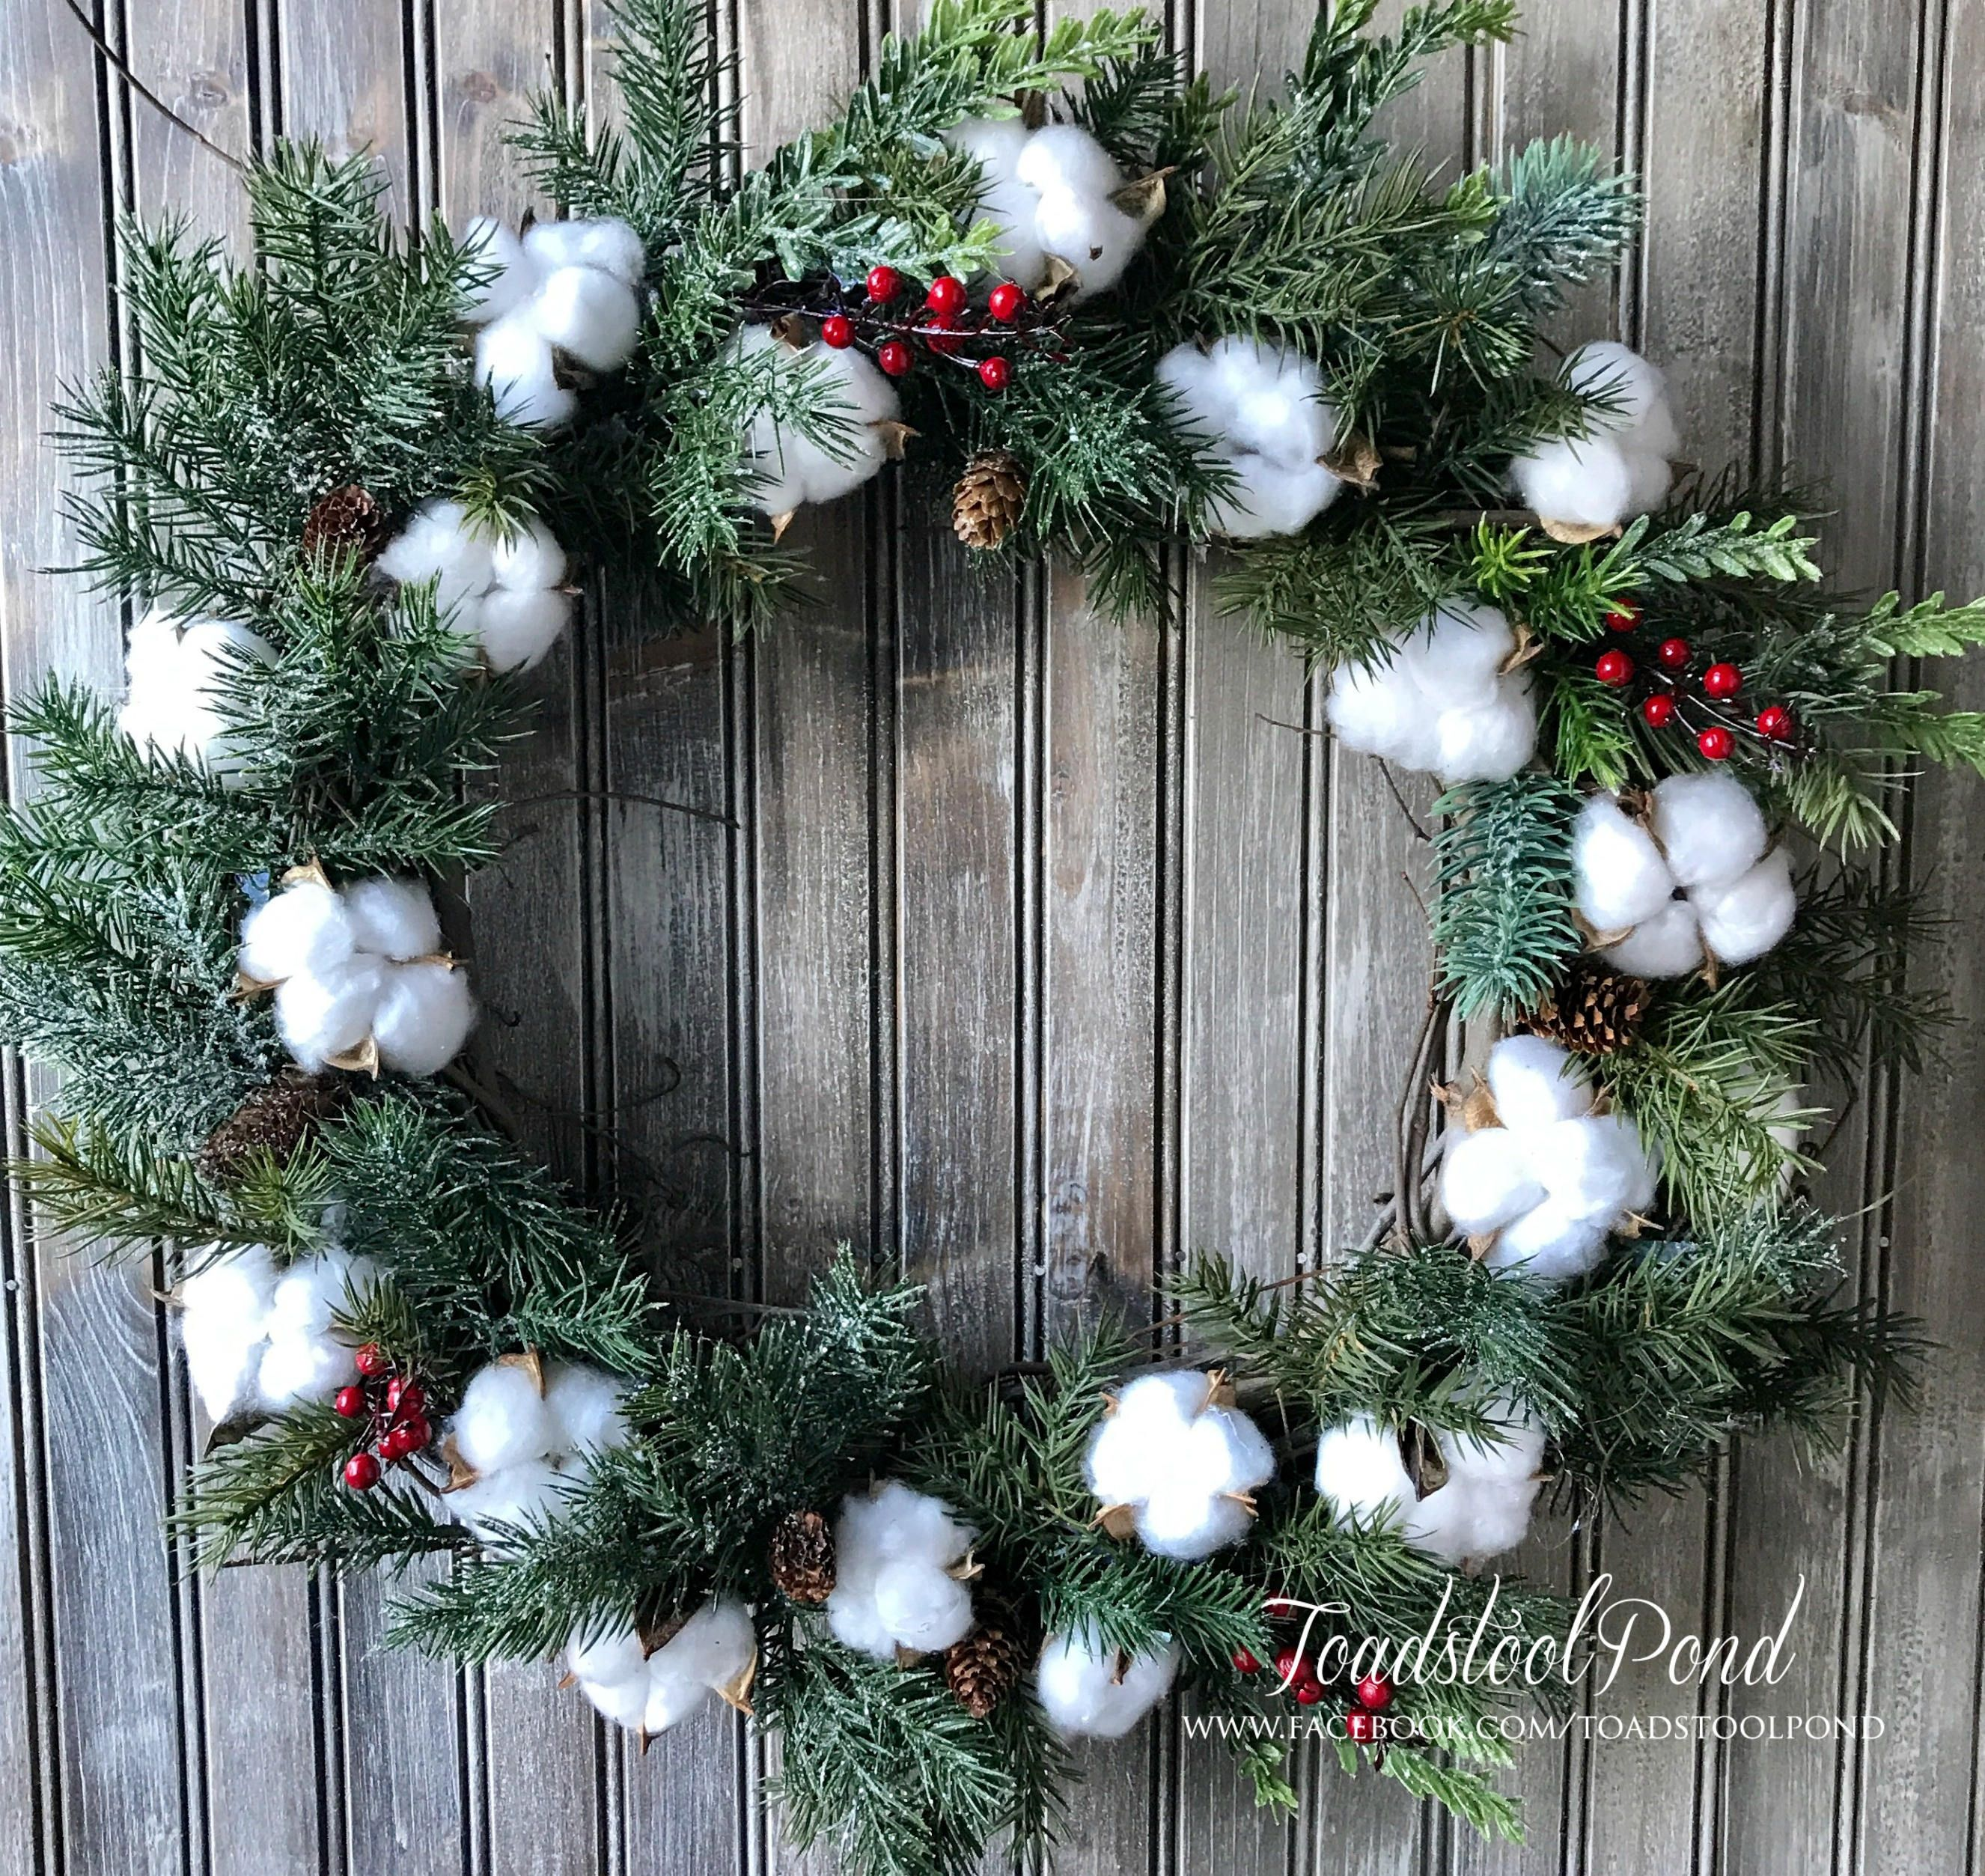 Cotton Boll Wreath Farmhouse Wreath Magnolia Inspired Cotton